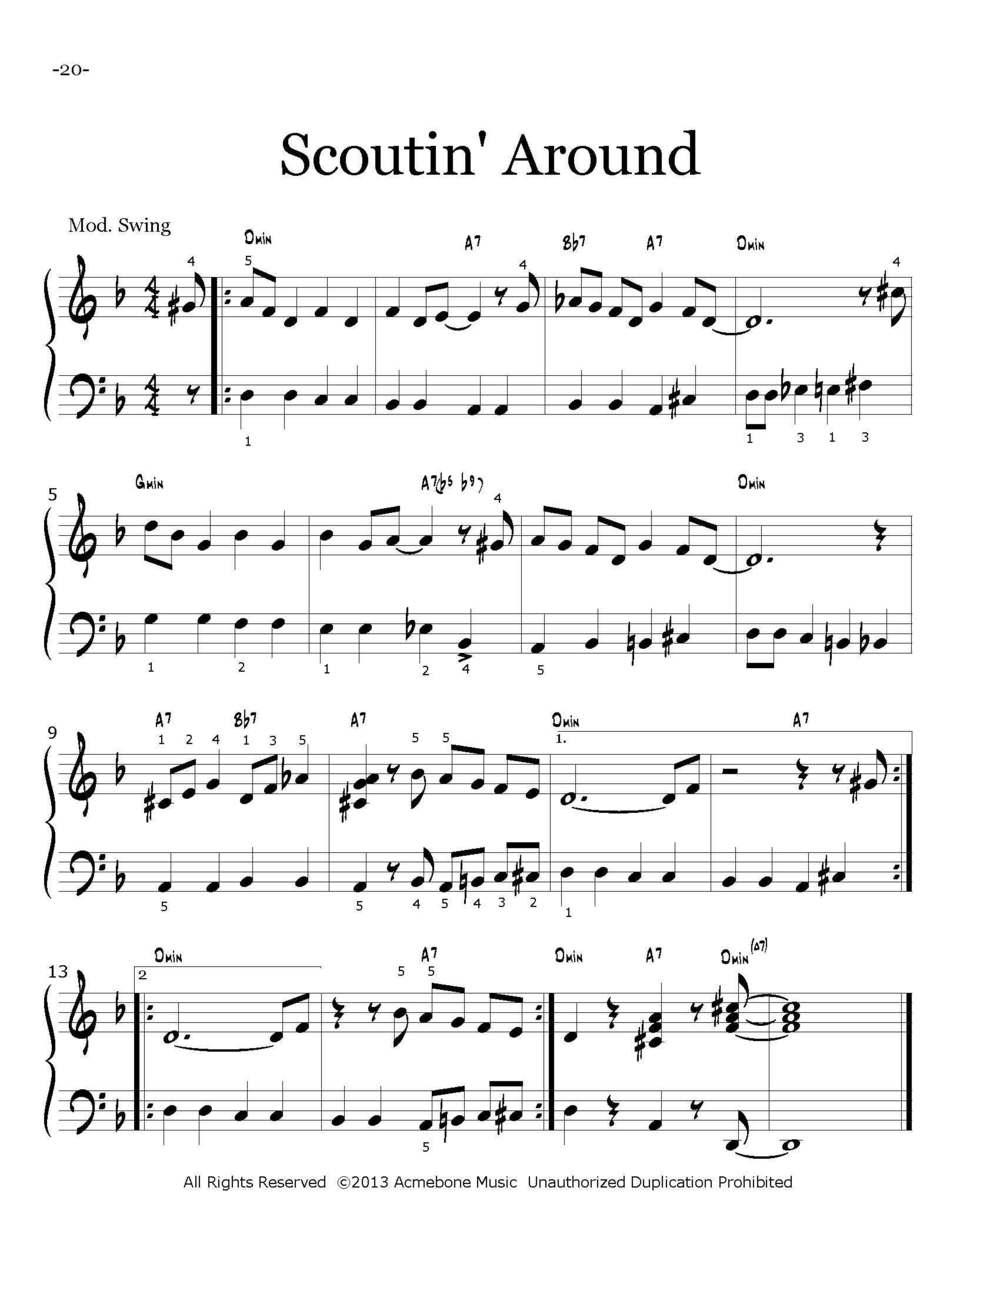 Progressive Jazz Etudes for Piano bk1 for web_Page_21.jpg